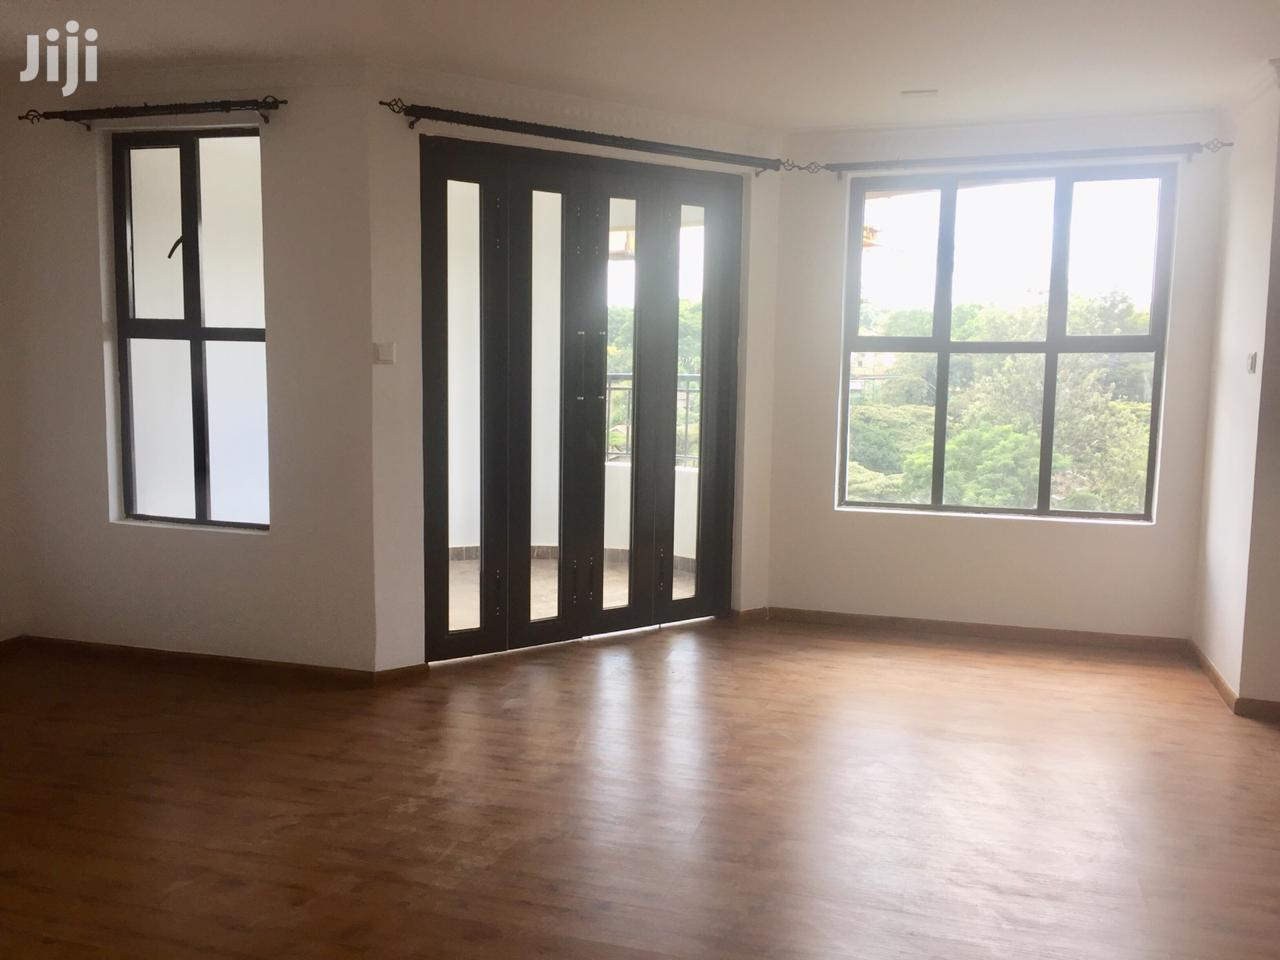 Stop Stairing! Riverside Three Bedroom Duplex Apartment.   Houses & Apartments For Rent for sale in Westlands, Nairobi, Kenya